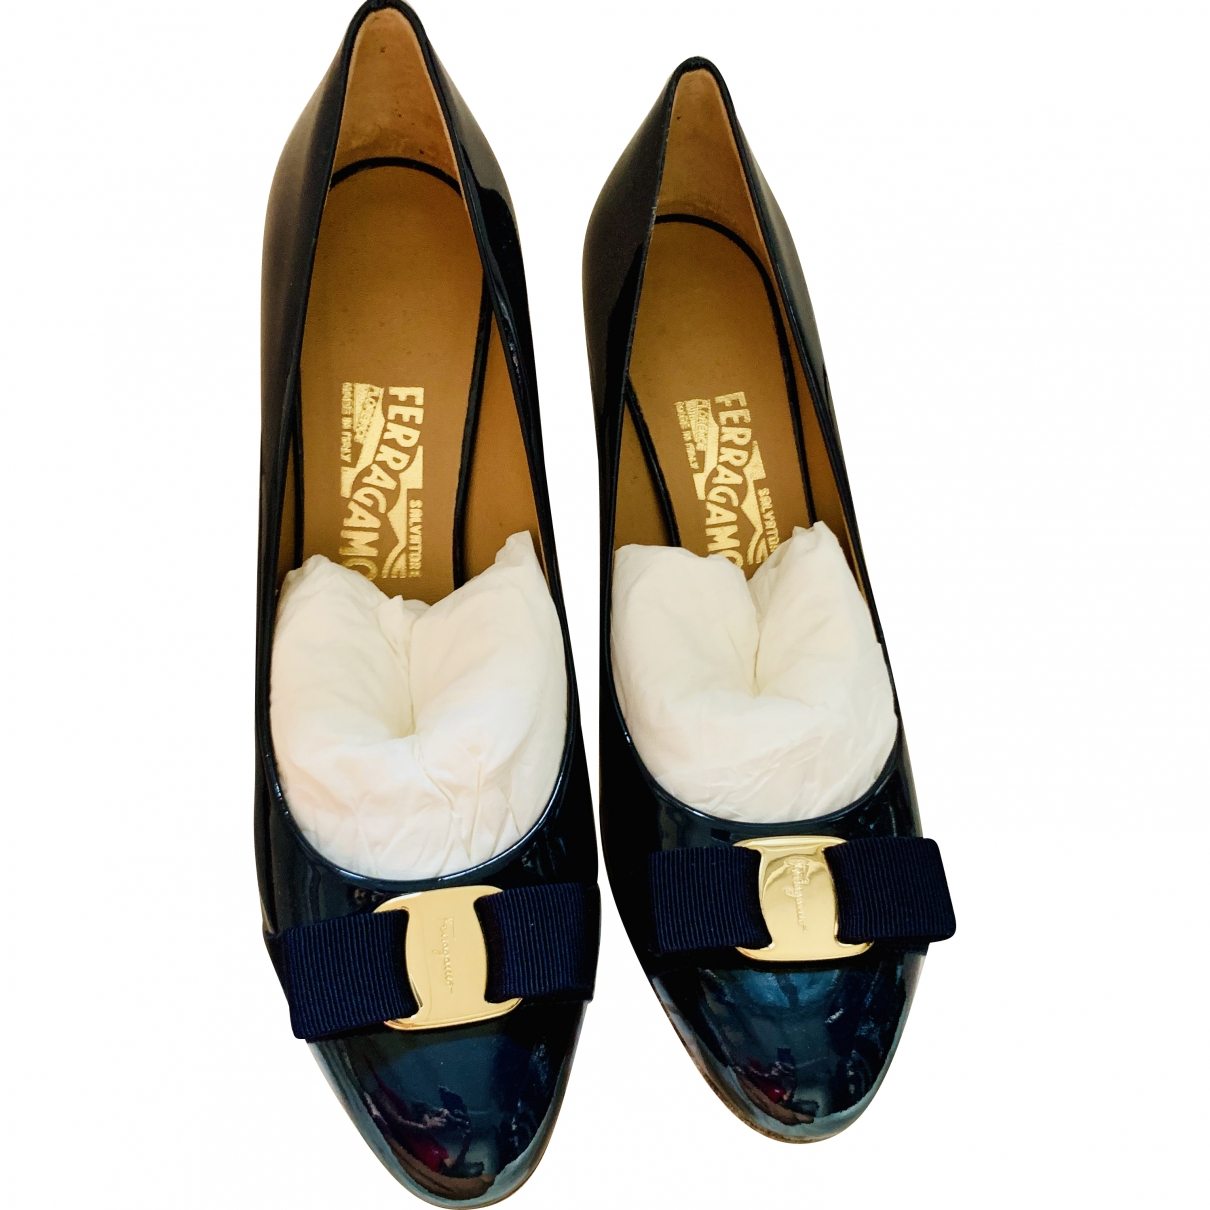 Salvatore Ferragamo \N Blue Patent leather Heels for Women 41 EU